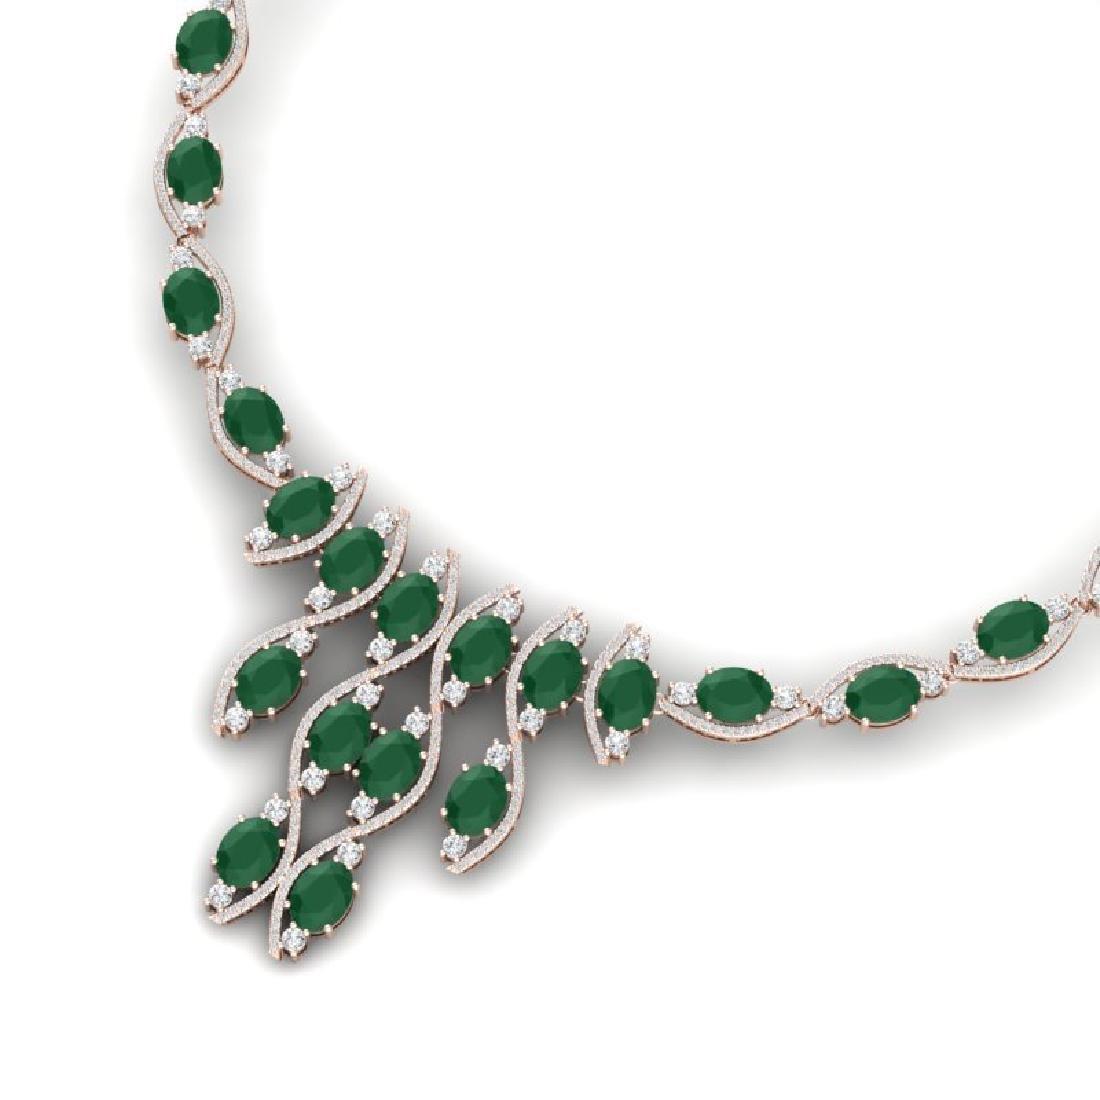 65.93 CTW Royalty Emerald & VS Diamond Necklace 18K